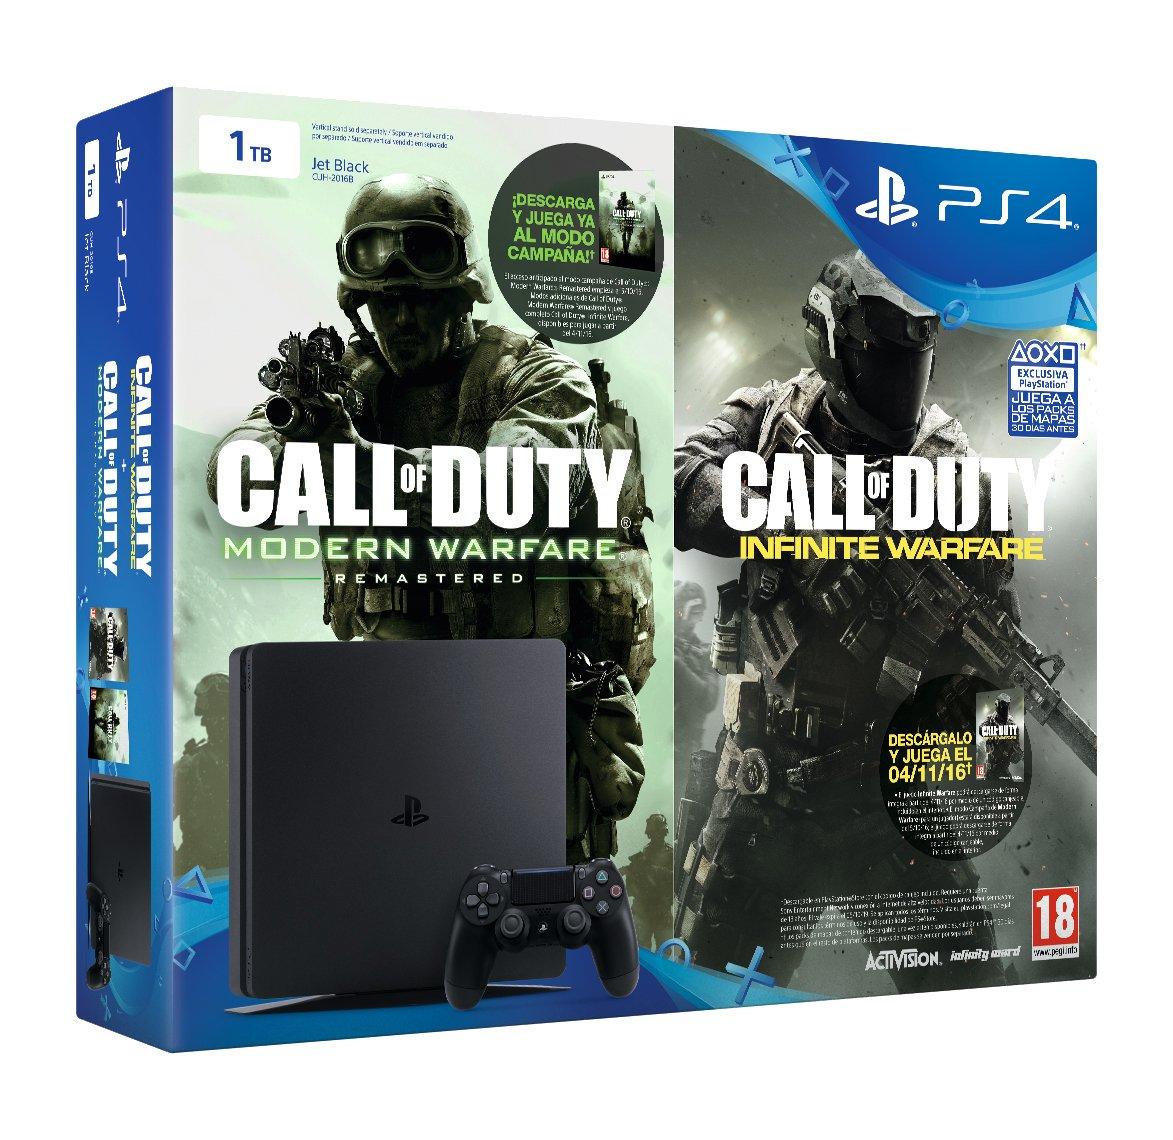 PlayStation 4 Slim (PS4) 1TB - Consola + Call Of Duty: Infinite Warfare + Call Of Duty: Modern Warfare Remasterizado: Amazon.es: Videojuegos